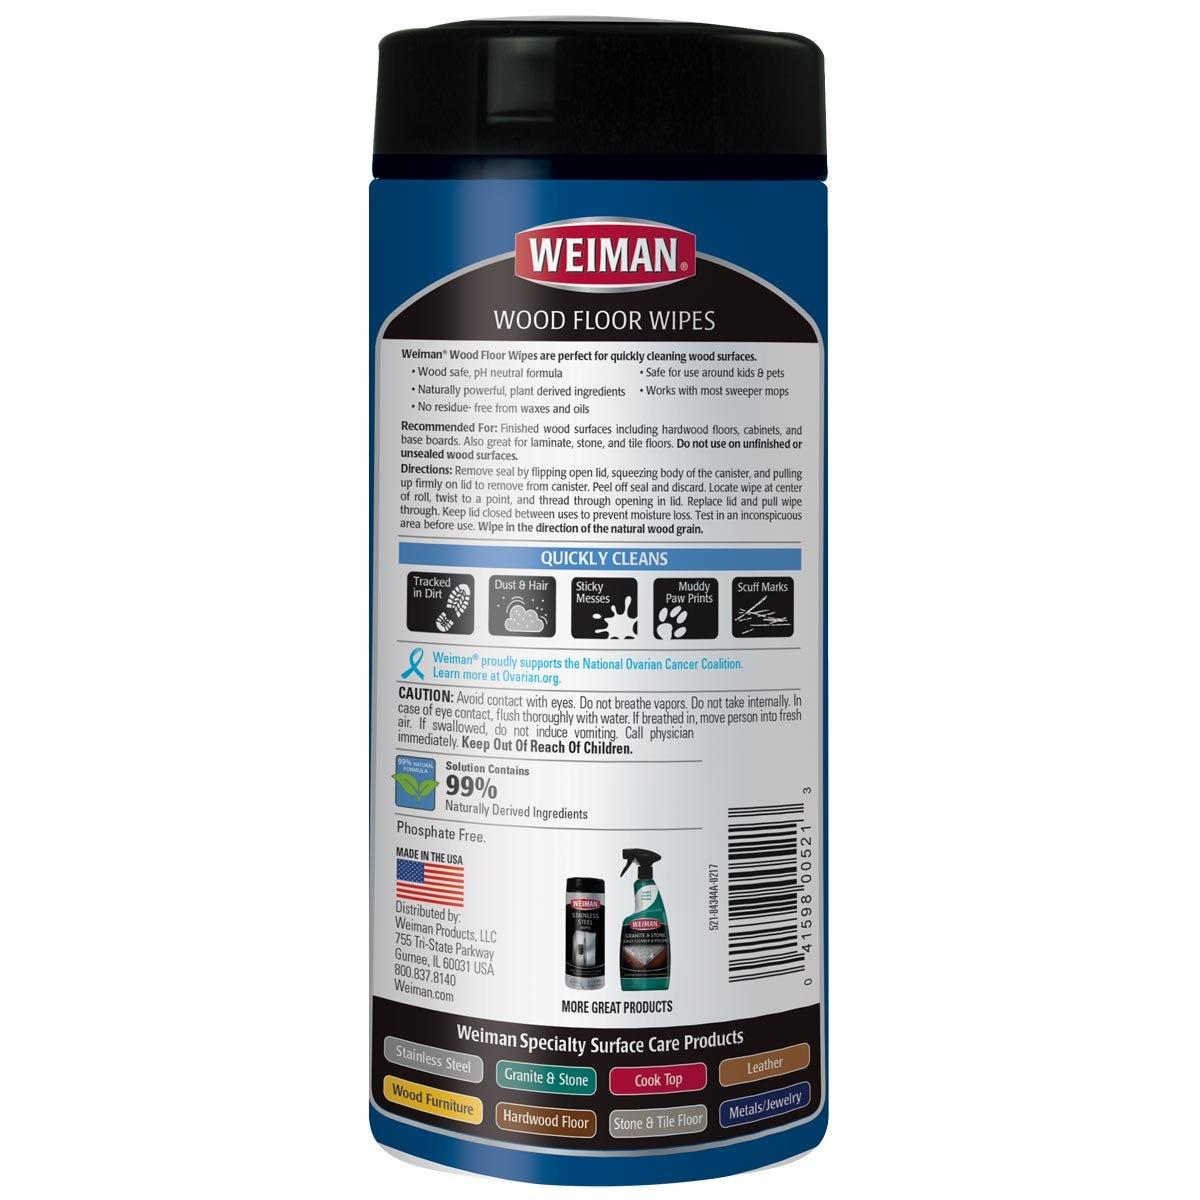 https://googone.com/media/catalog/product/w/e/weiman-wood-floor-wipes_back.jpg